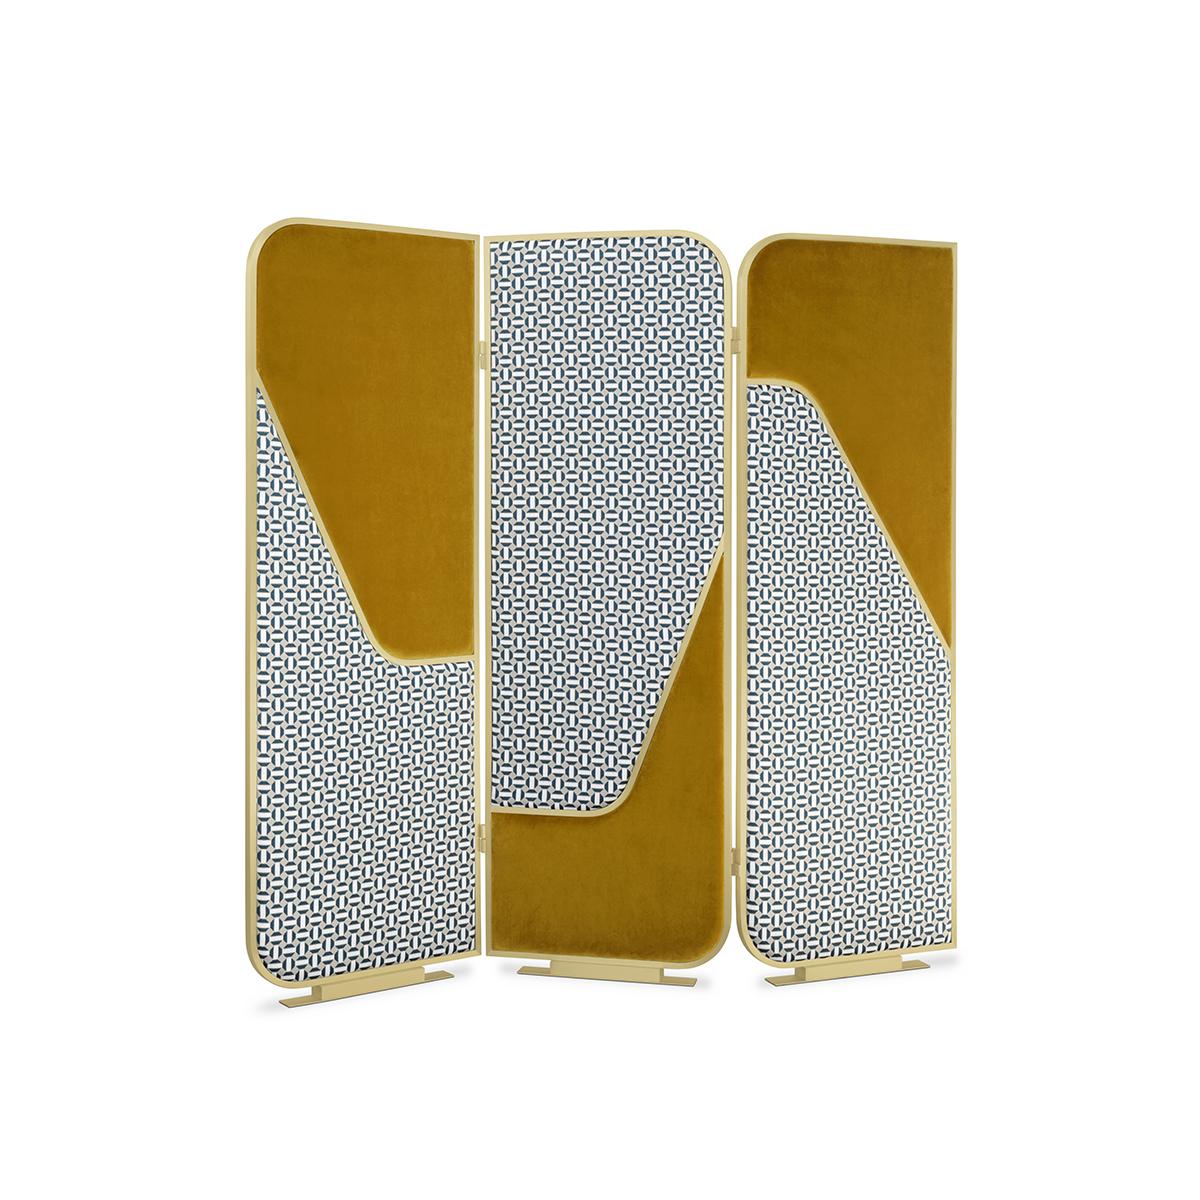 Pantallas Lujuosas: Ideas exclusivas para un proyecto moderno pantallas lujuosas Pantallas Lujuosas: Ideas exclusivas para un proyecto moderno essentialhome giulietta screen 2